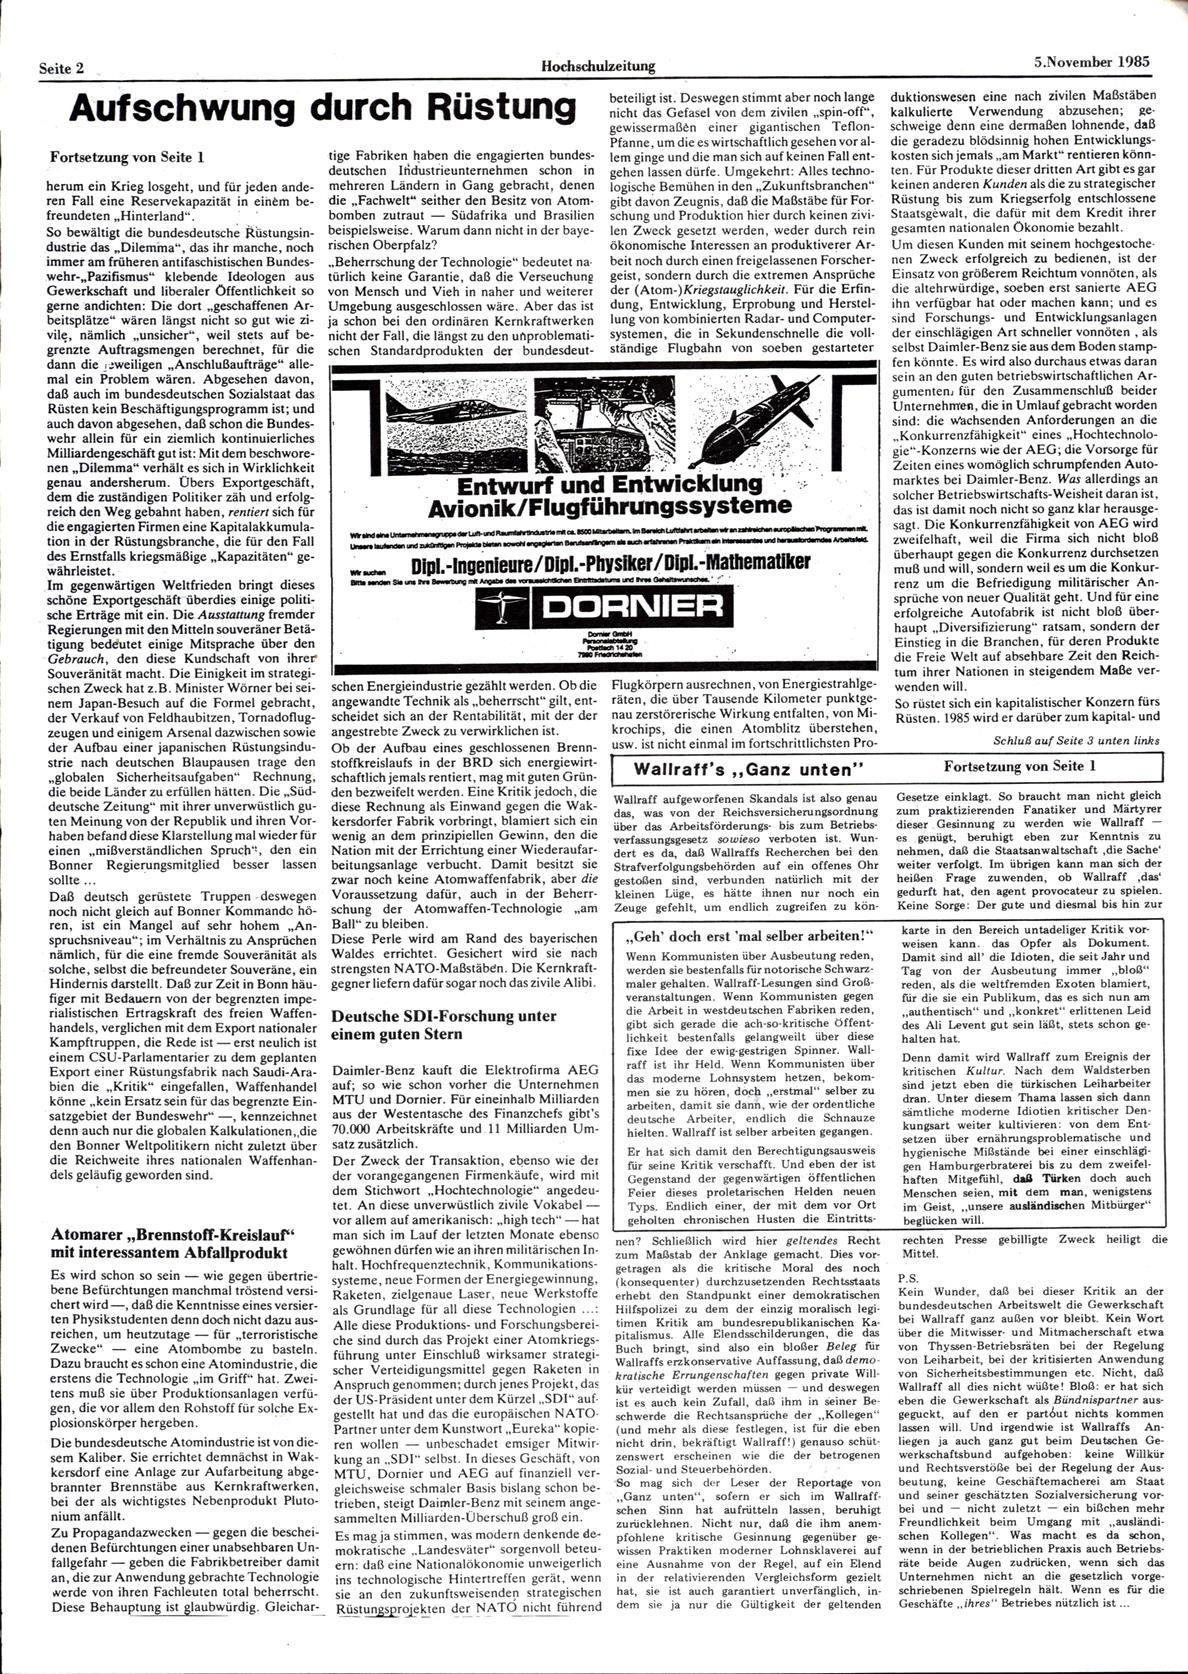 Bochum_BHZ_19851105_117_002